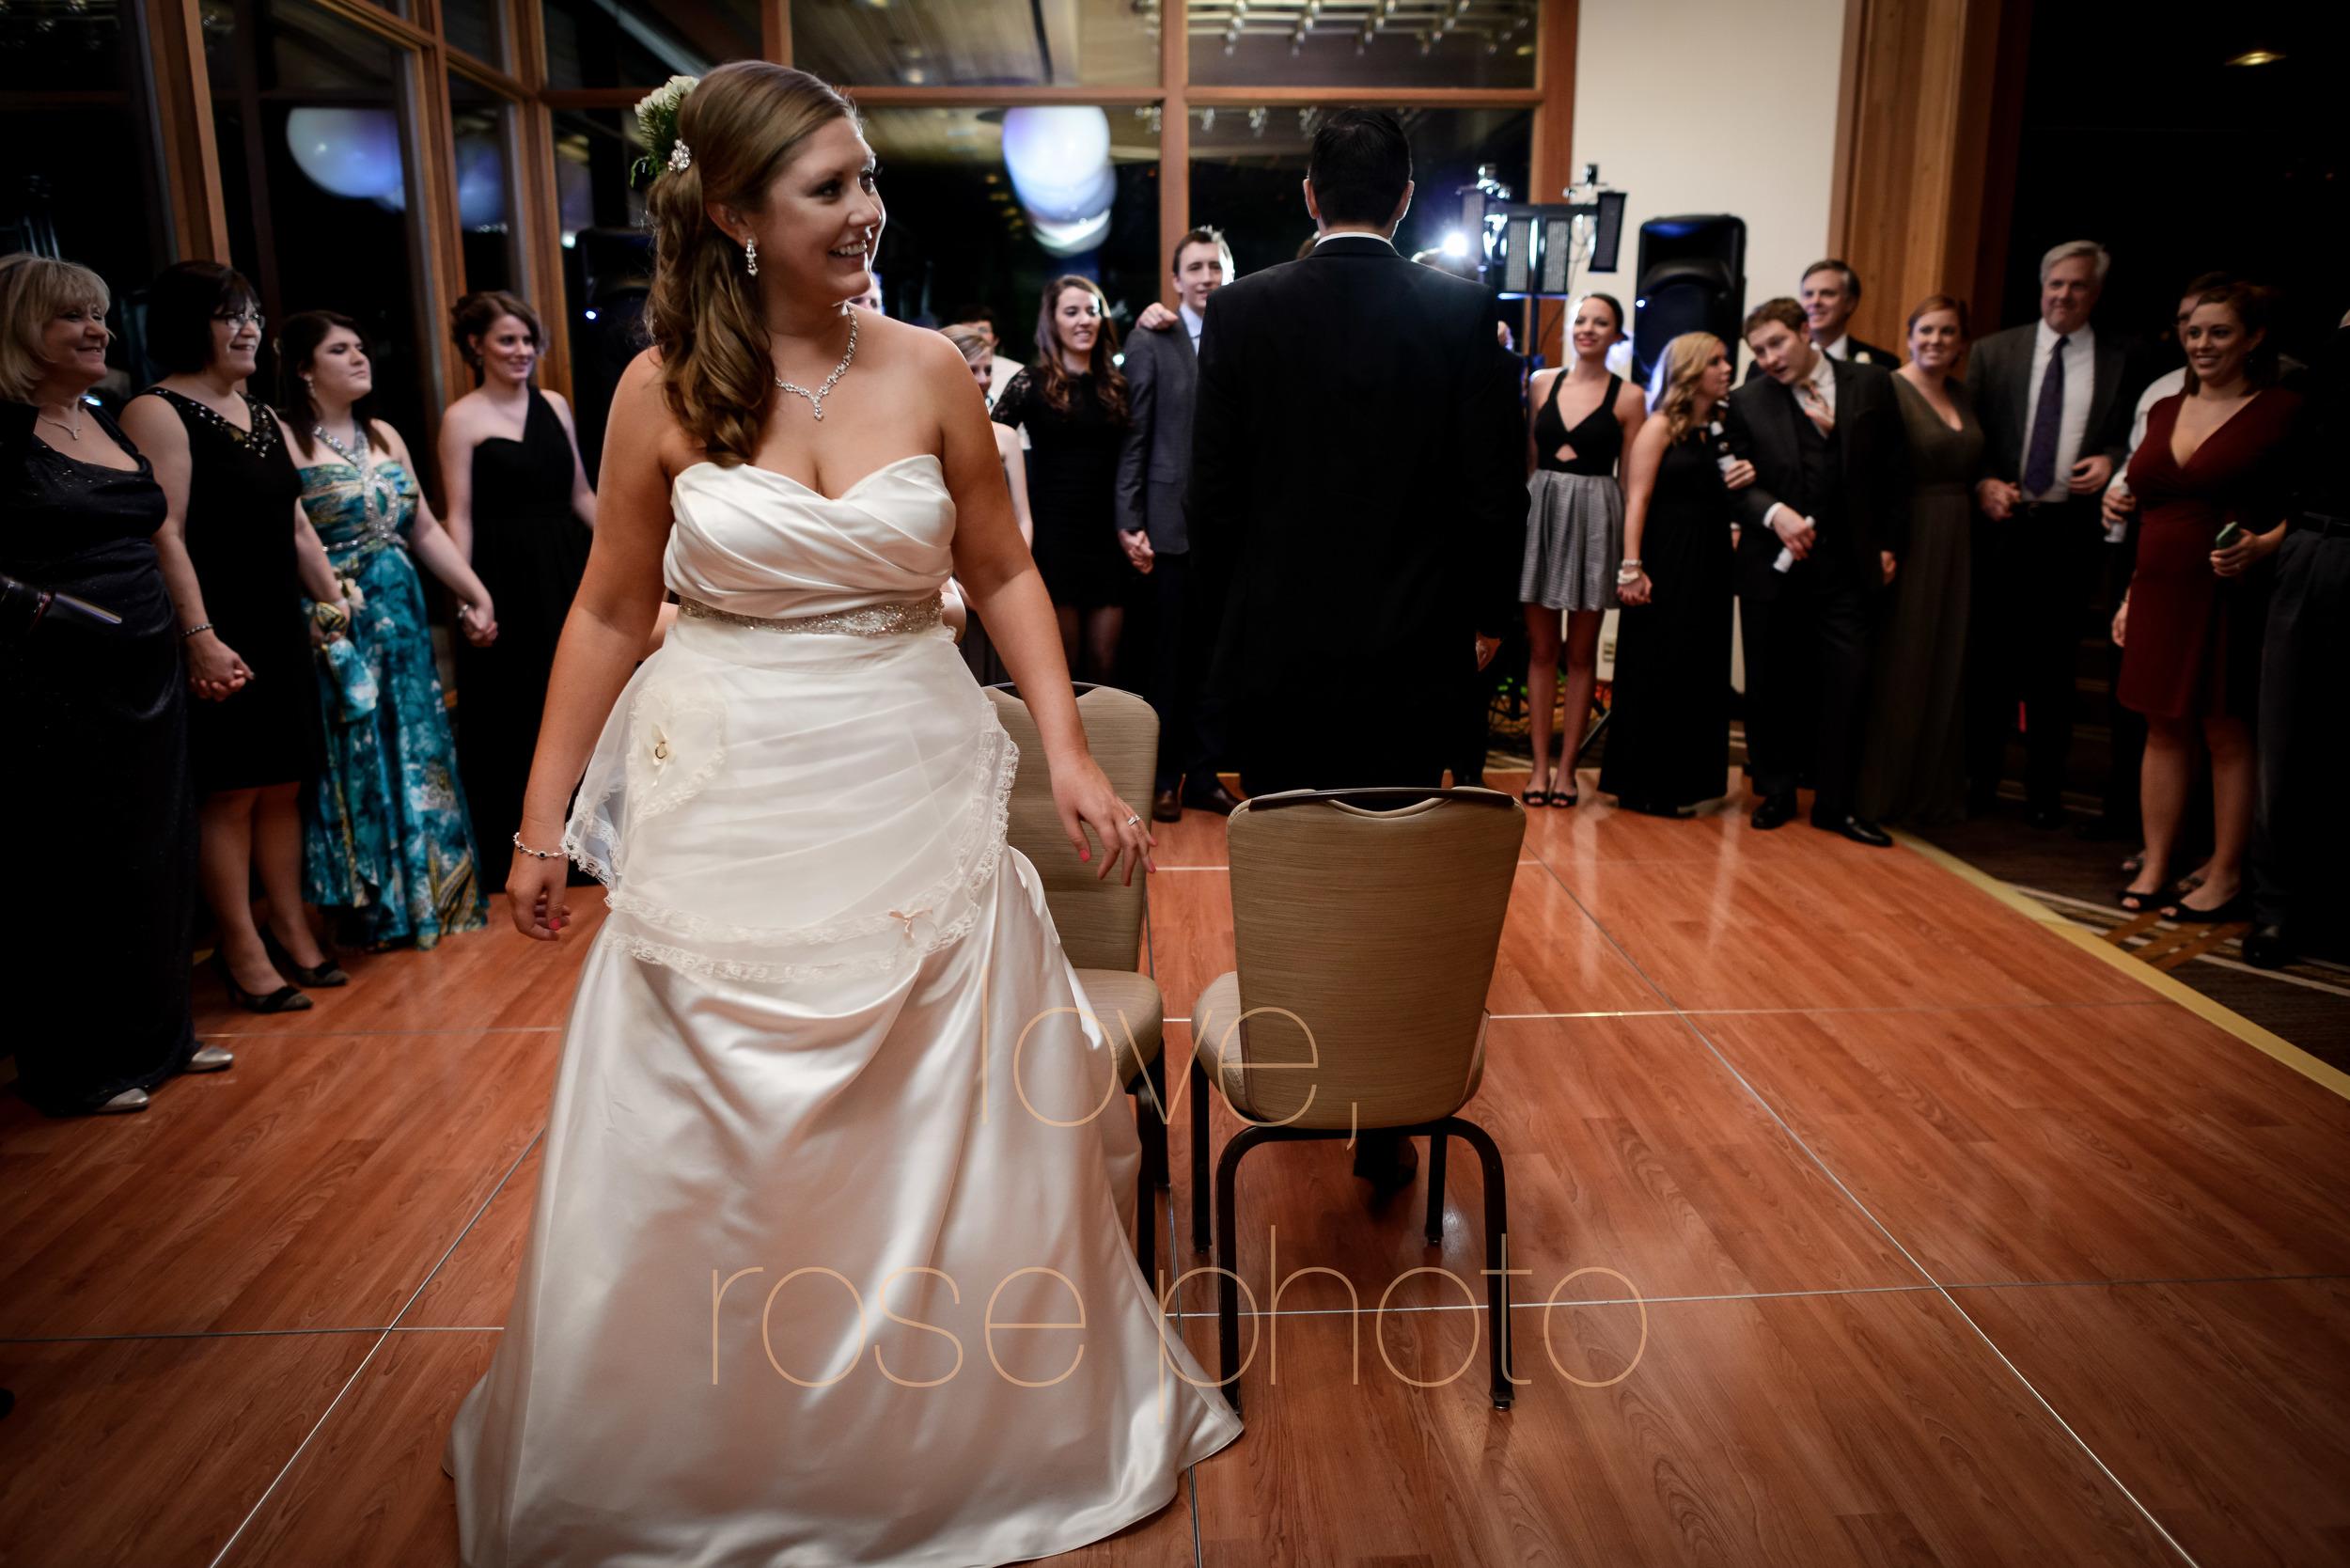 katie + even new years eve chicago oak brook mcdonalds lodge 2014 polish wedding balloon drop champagne-016-2.jpg